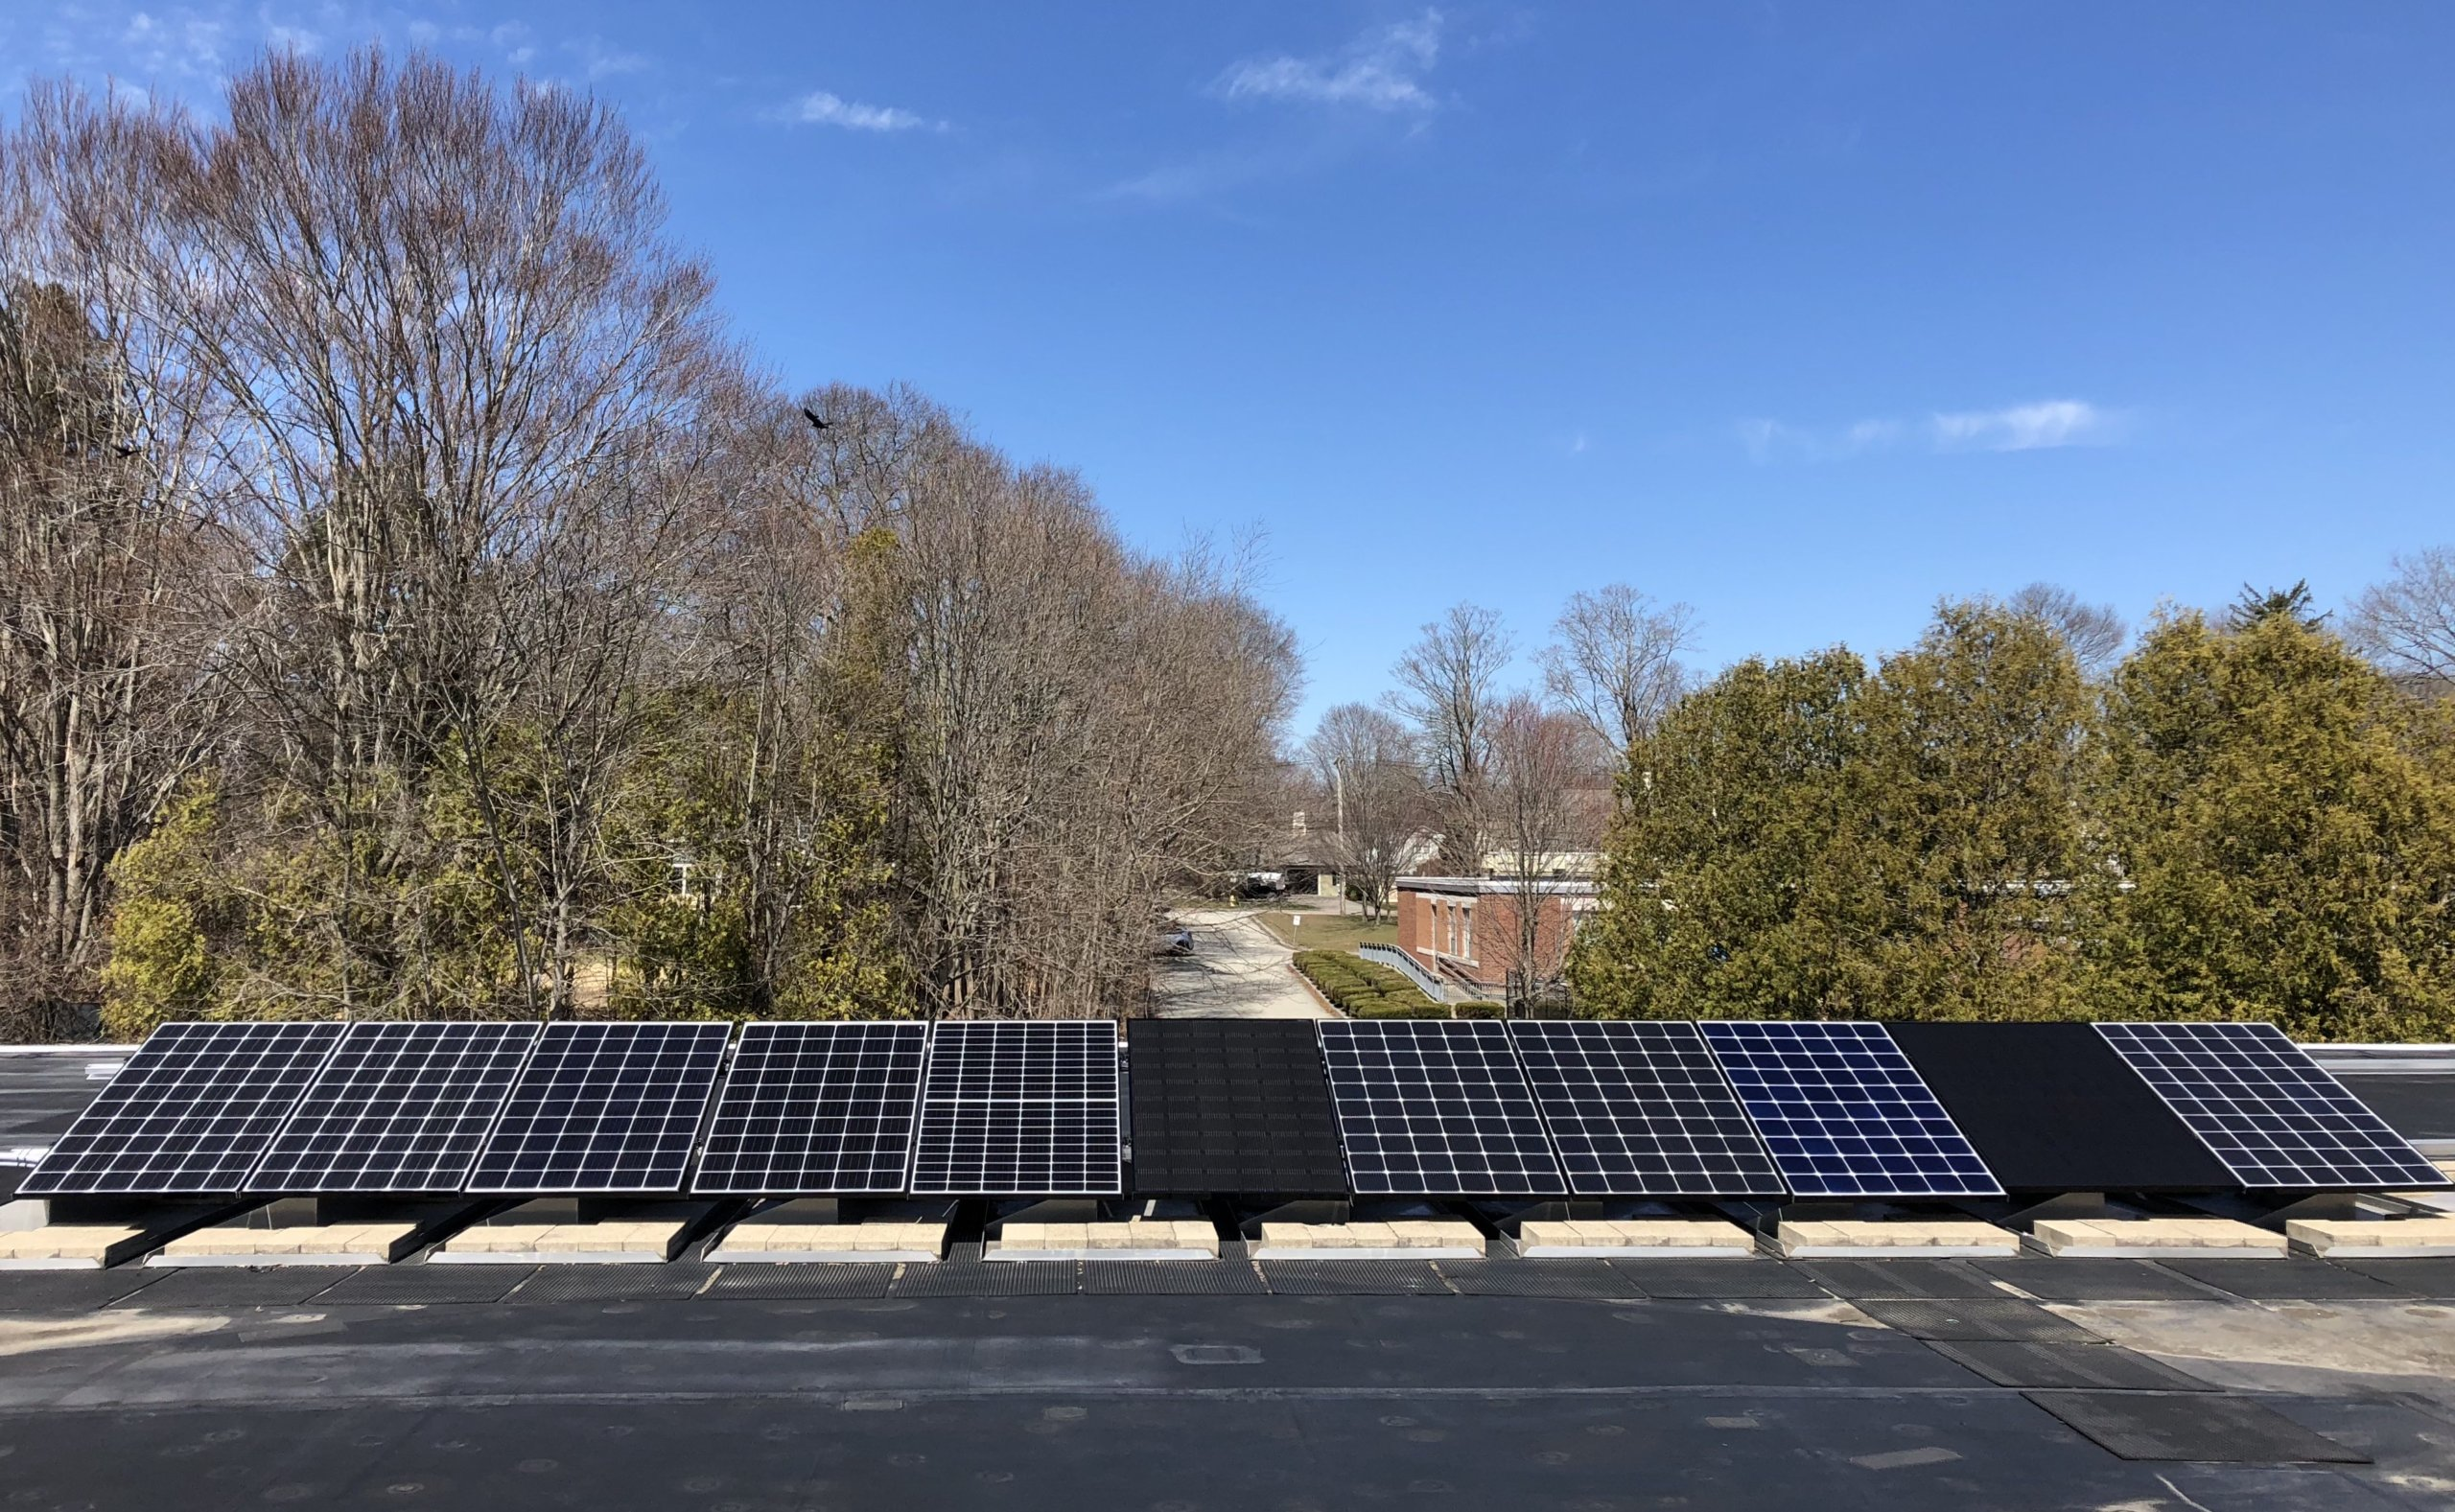 Hingham High School's solar array, donated by My Generation Energy, a Massachusetts solar installer